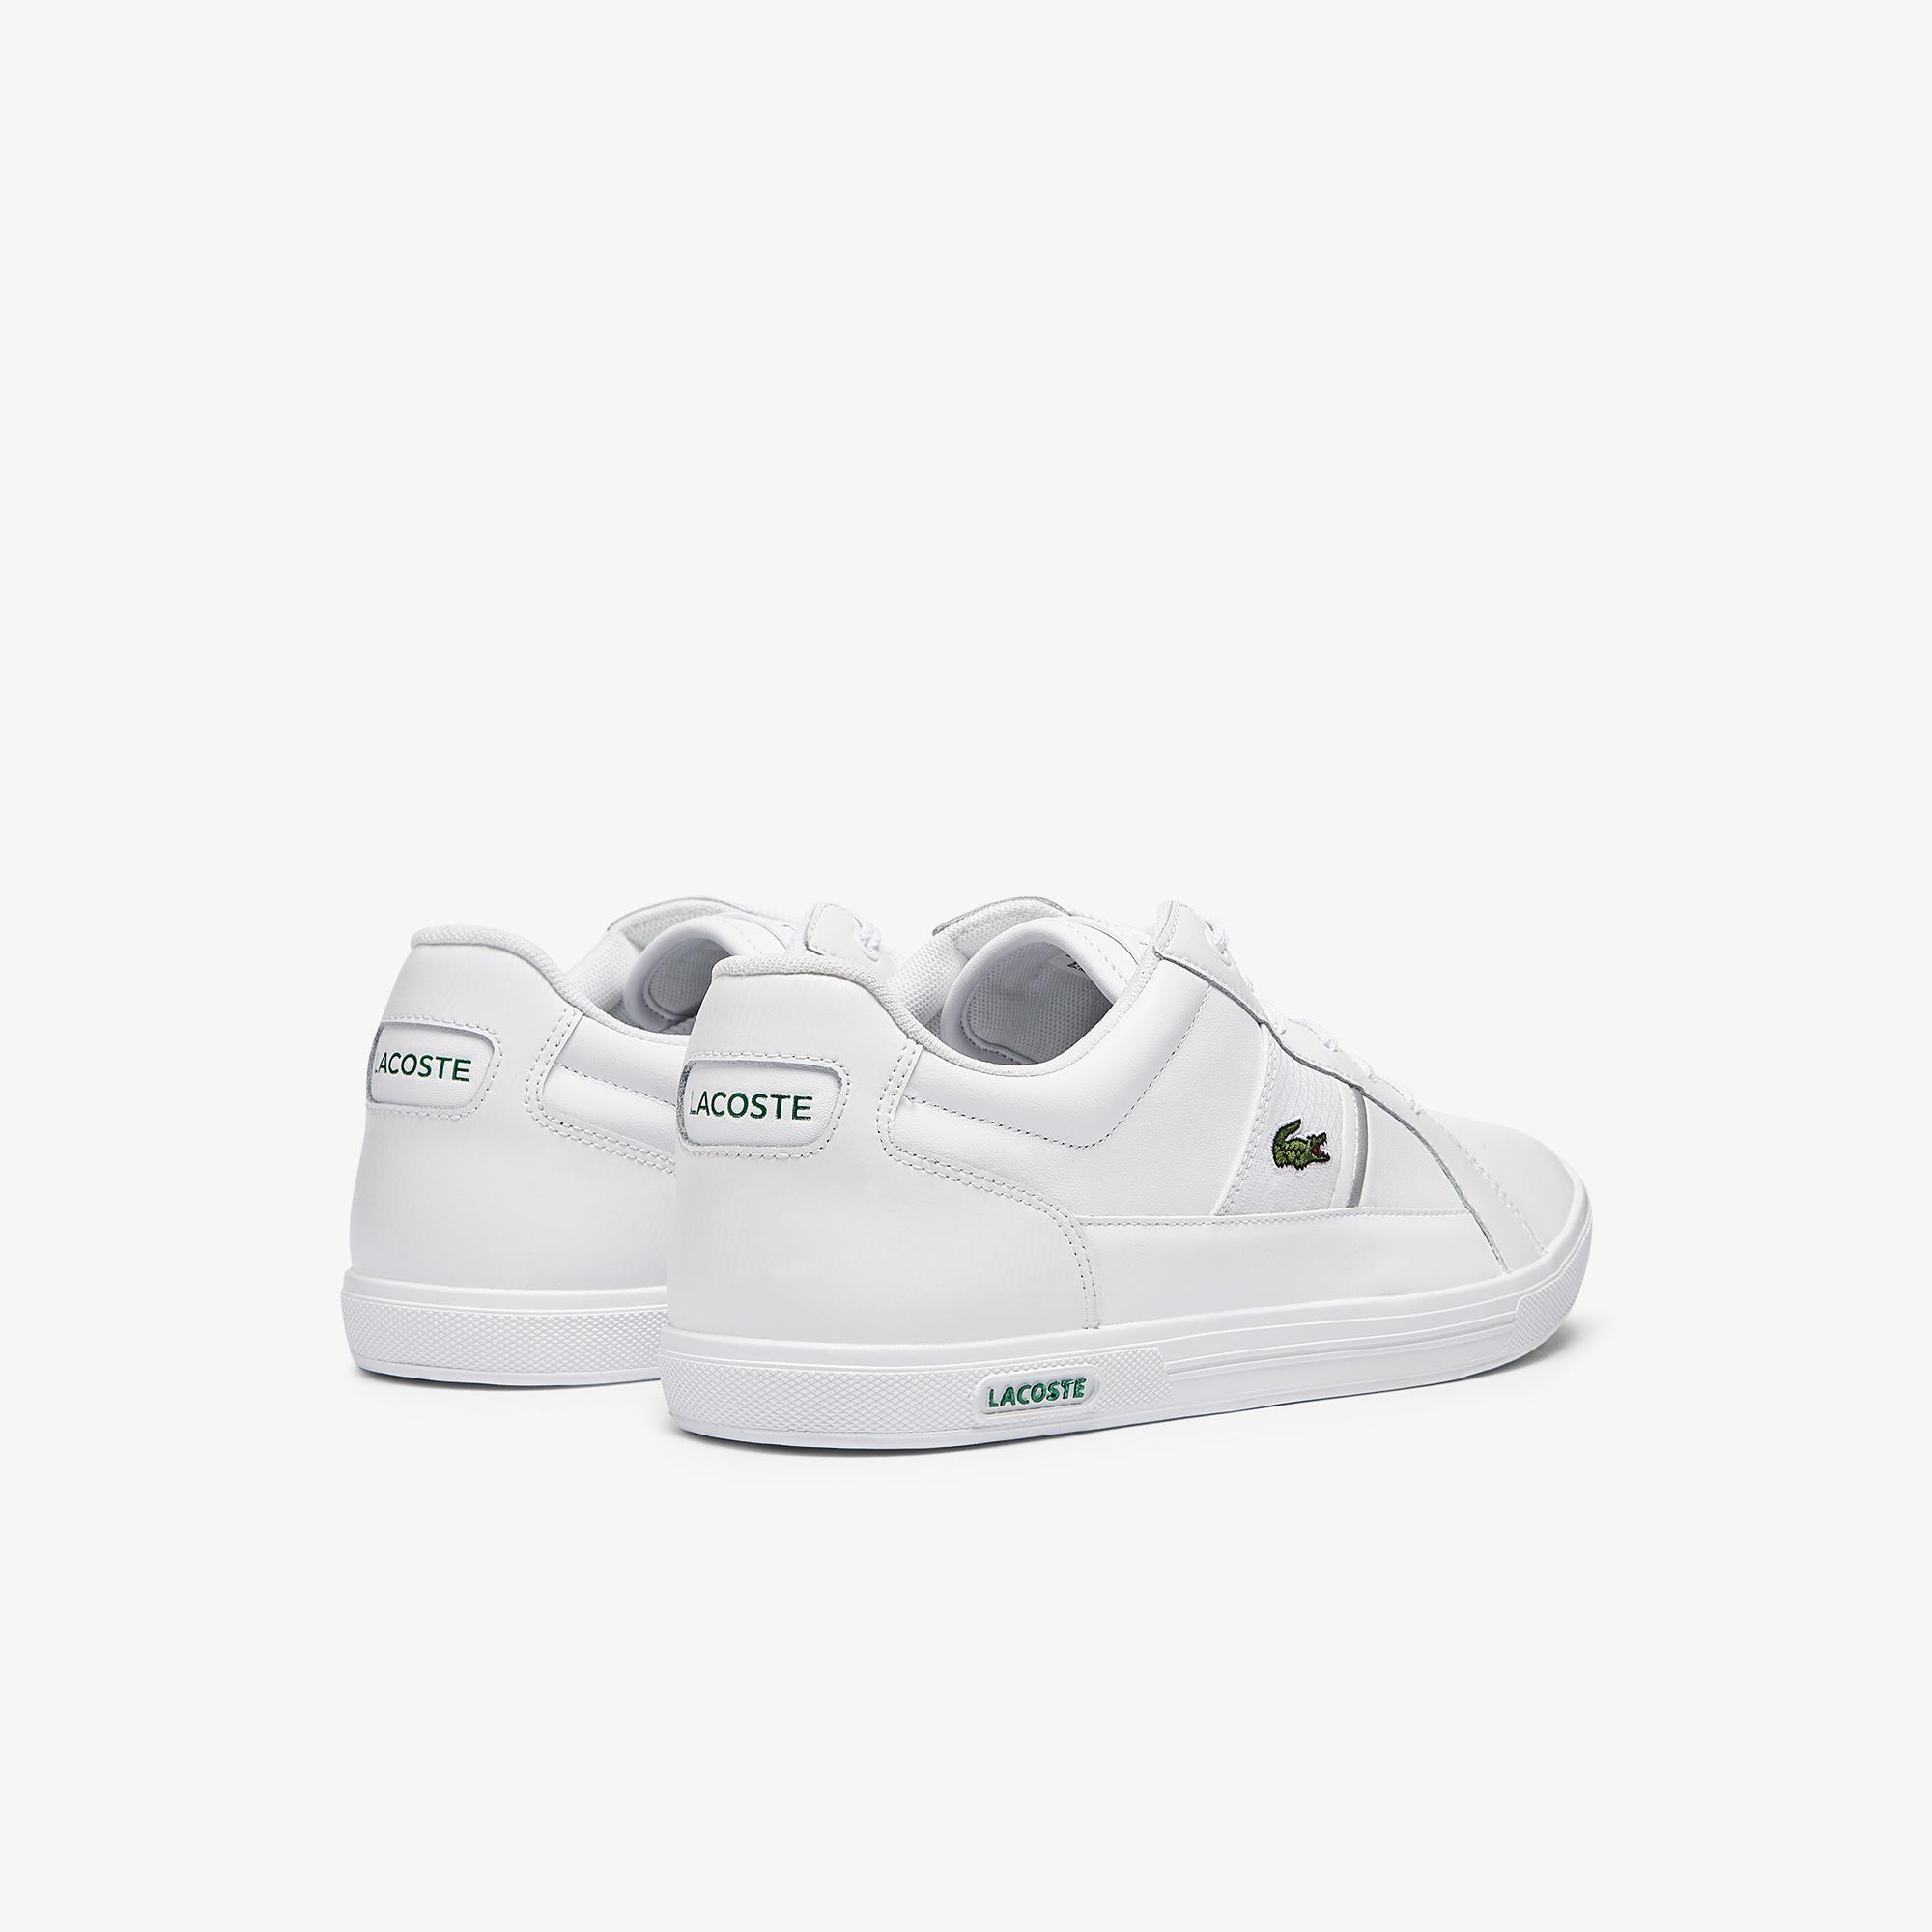 Lacoste Men's Europa 0721 1 Sma Shoes